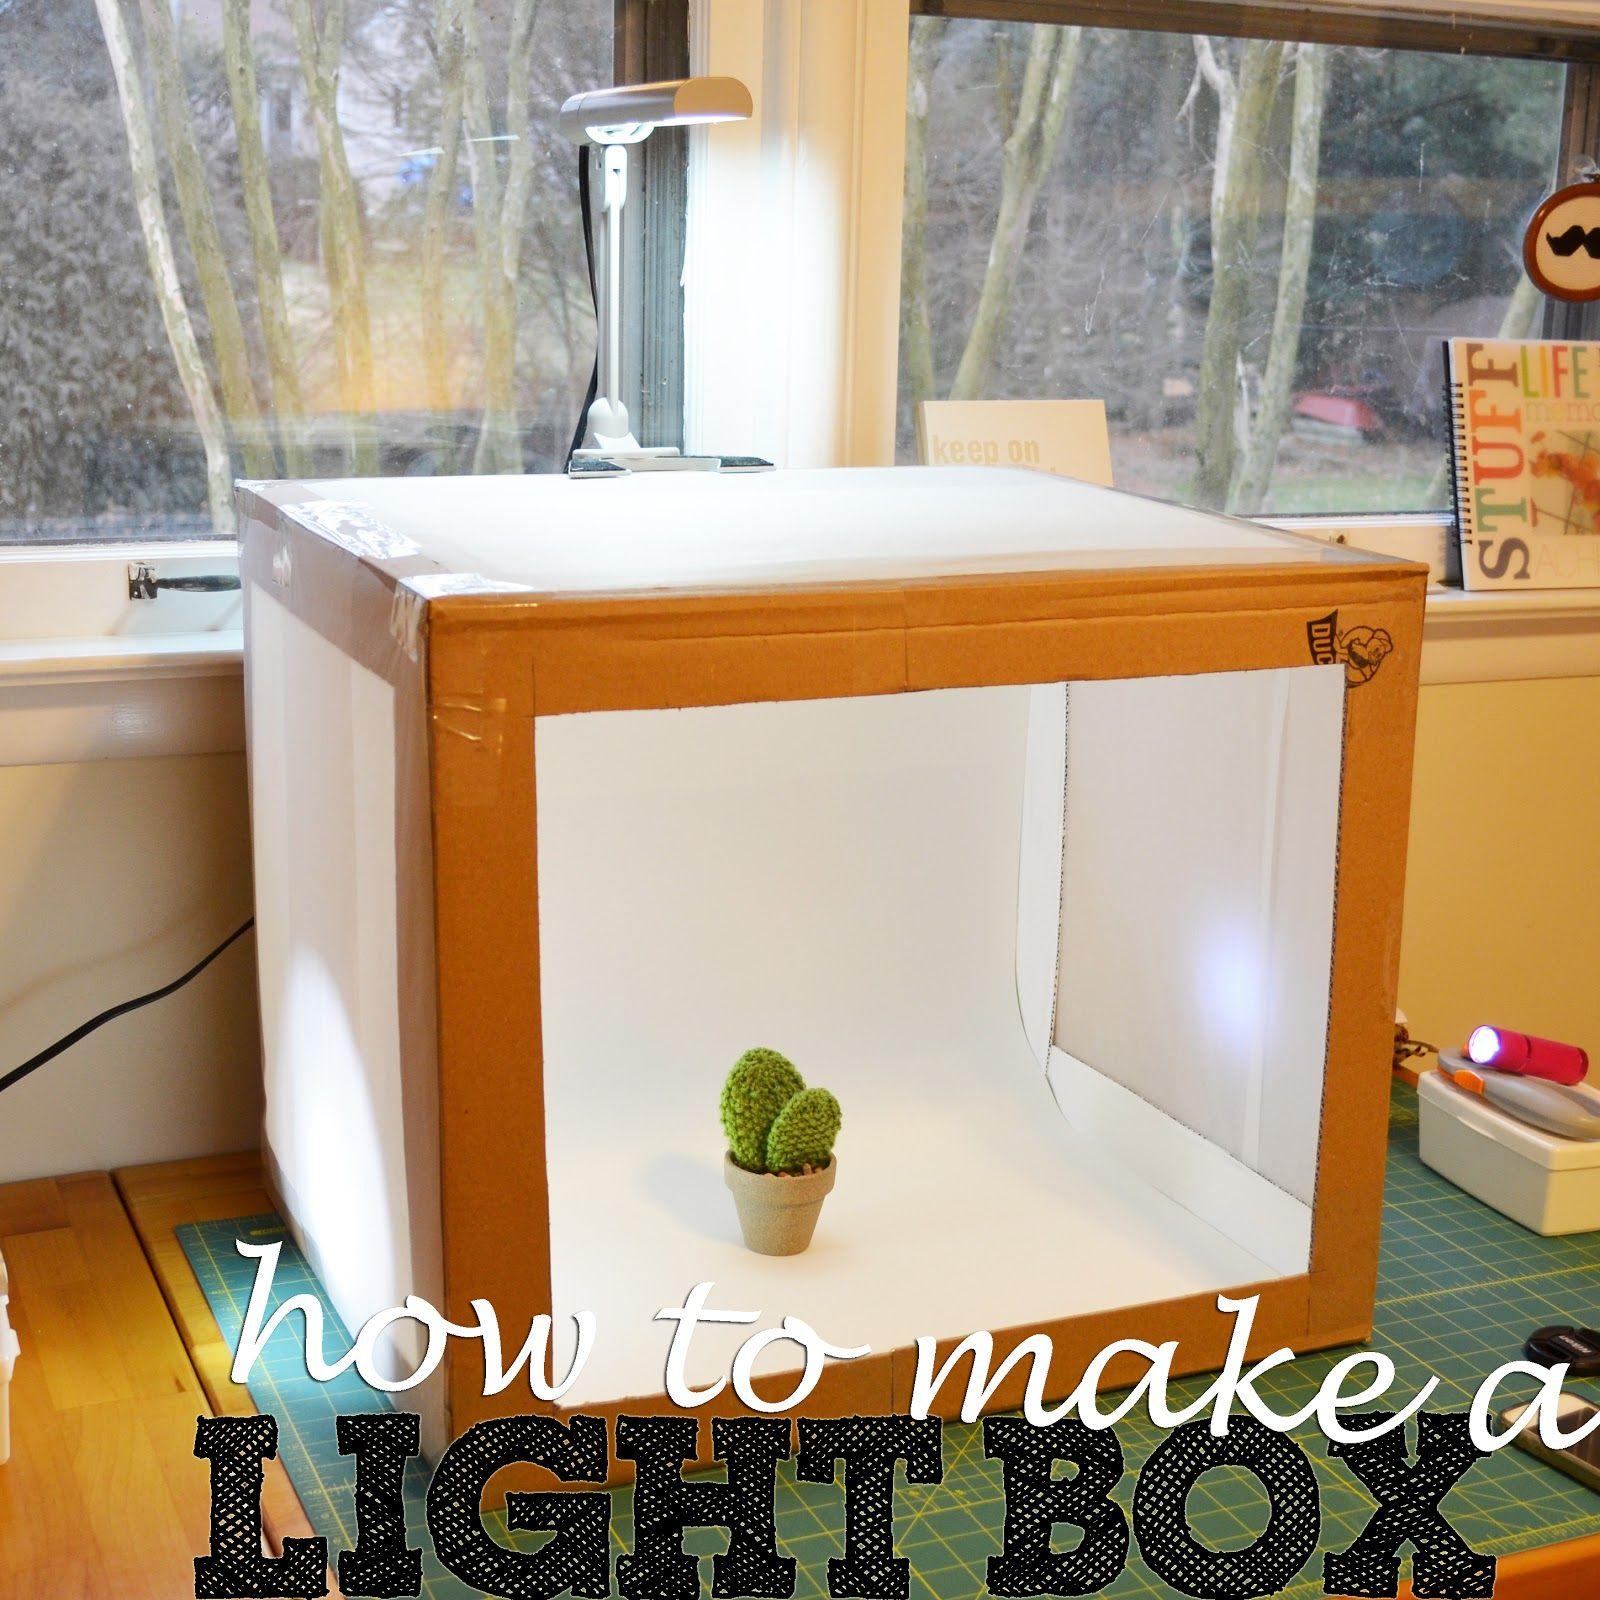 Light Box Photo Light Box Light Box Photography Light Box Diy